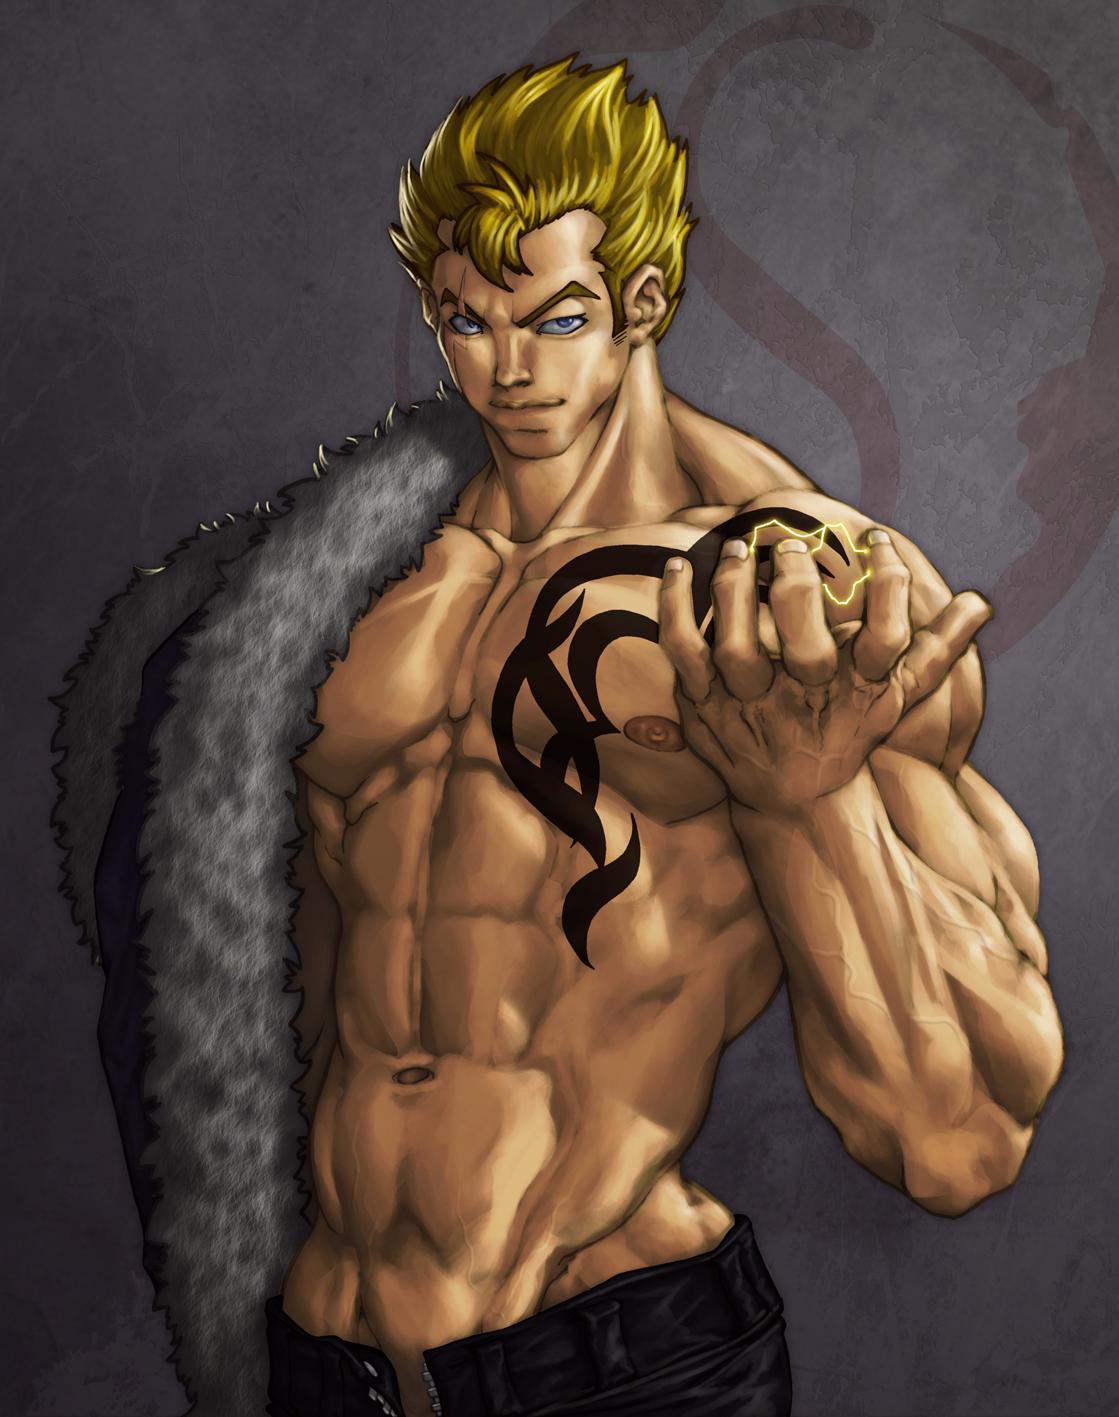 Laxus Dreyar - FAIRY TAIL | page 3 of 3 - Zerochan Anime ...